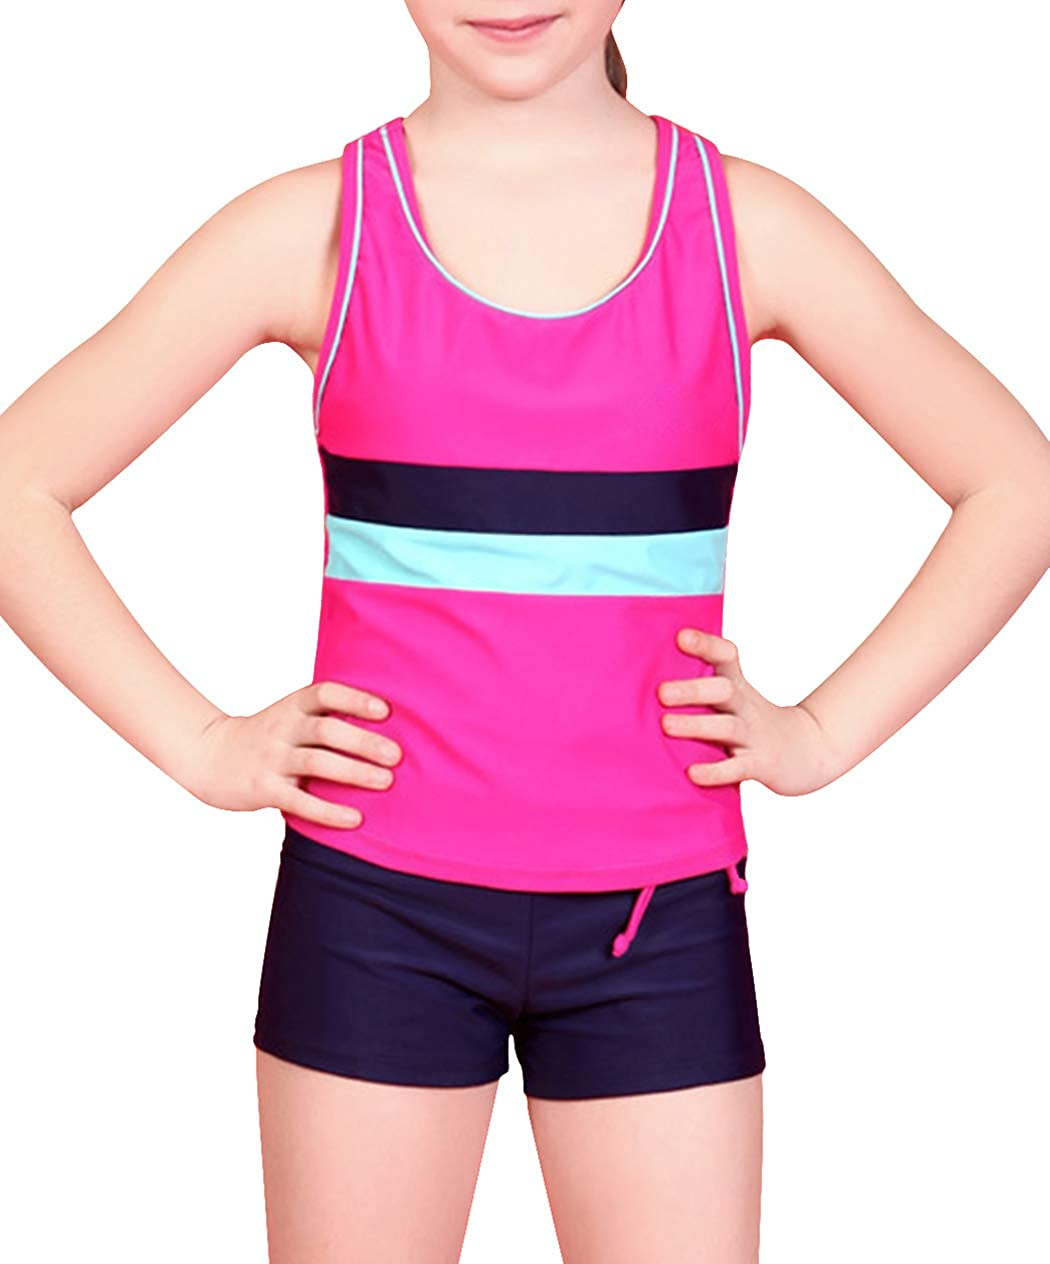 Kantenia Little Girls Two Piece Boyshort Tankini Kids Girl Swimsuit Summer Beach Bathing Suit Clothes